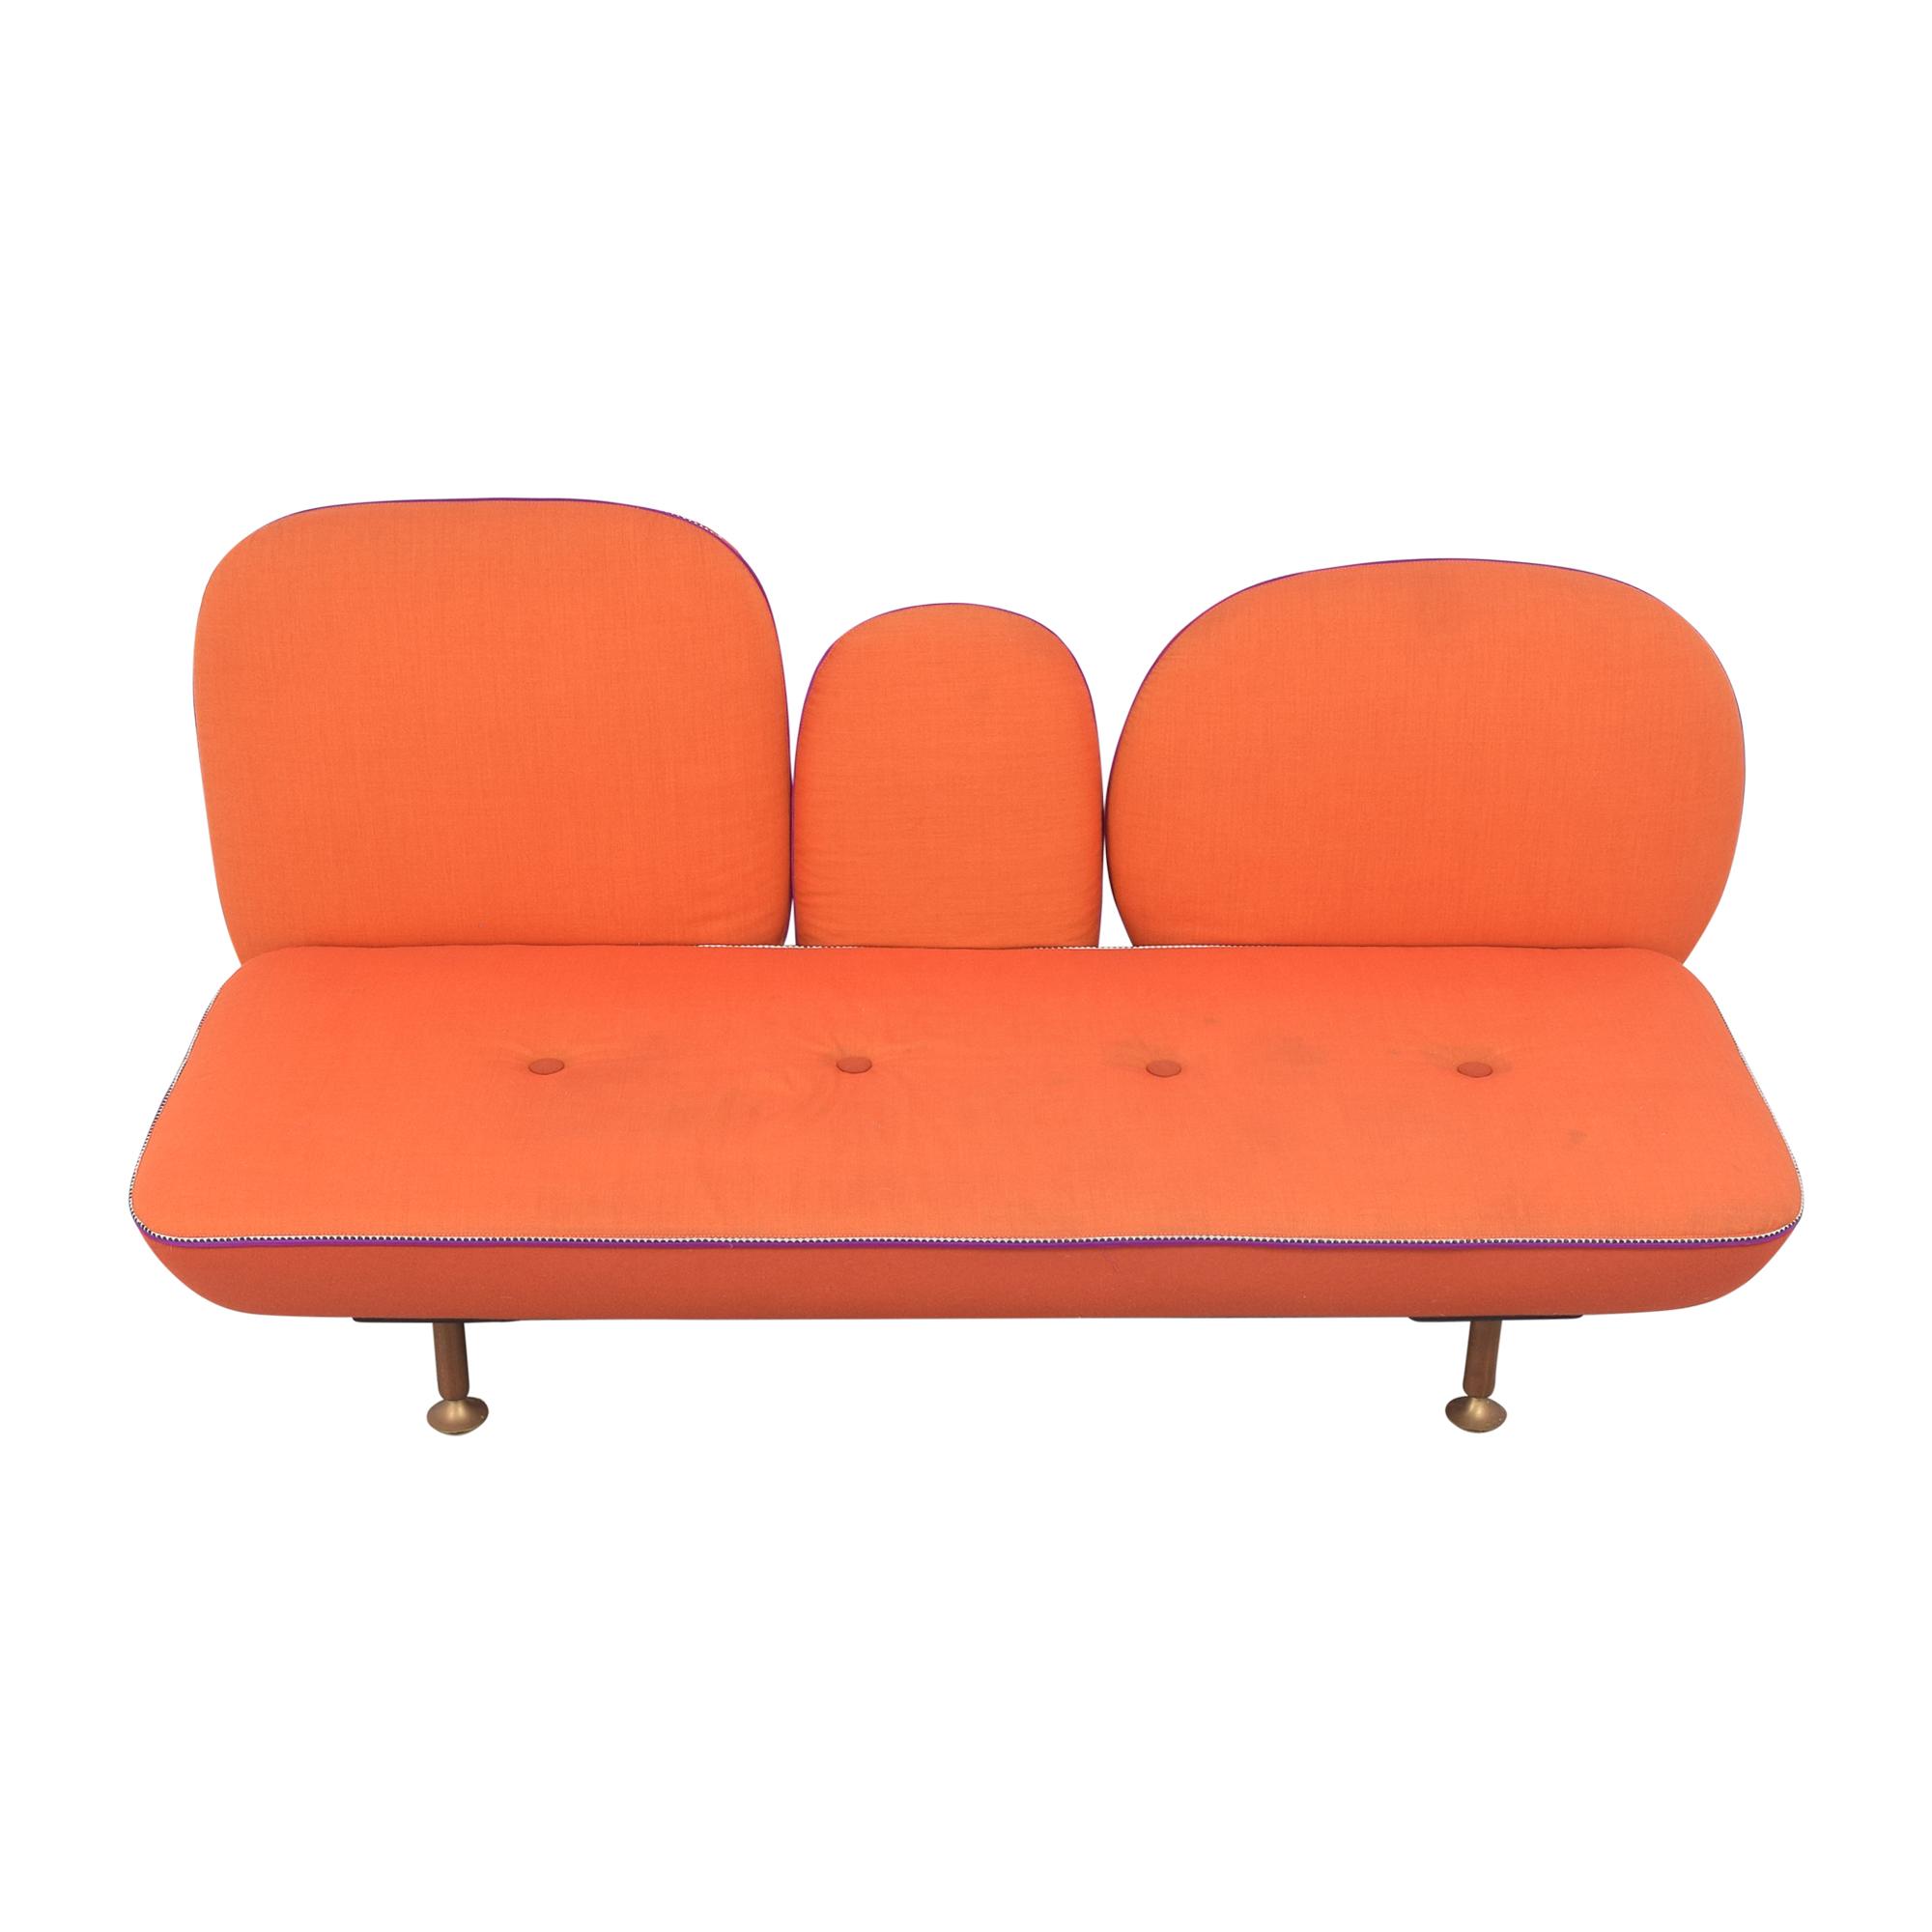 Moroso Moroso My Beautiful Backside Sofa nj